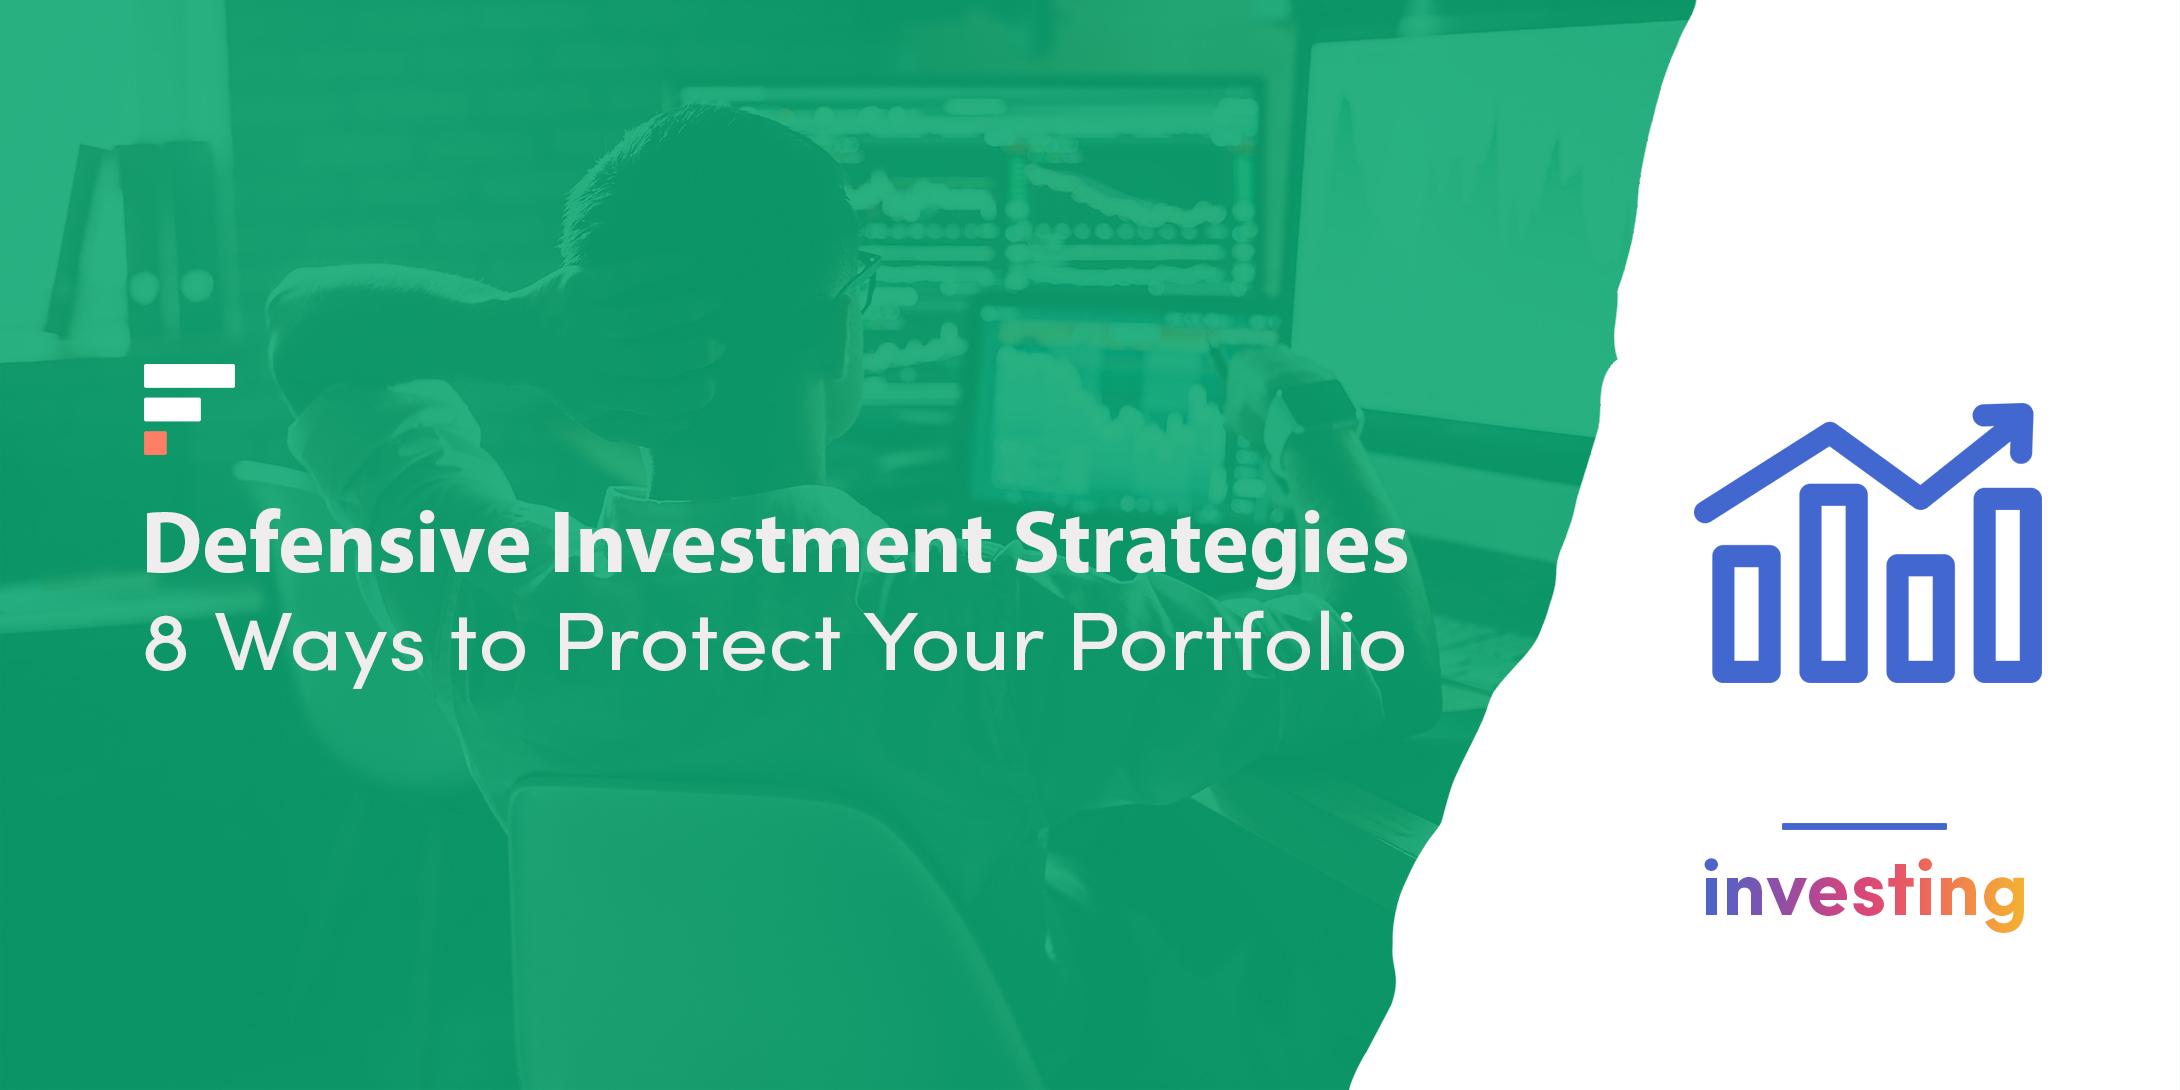 Defensive investment strategies